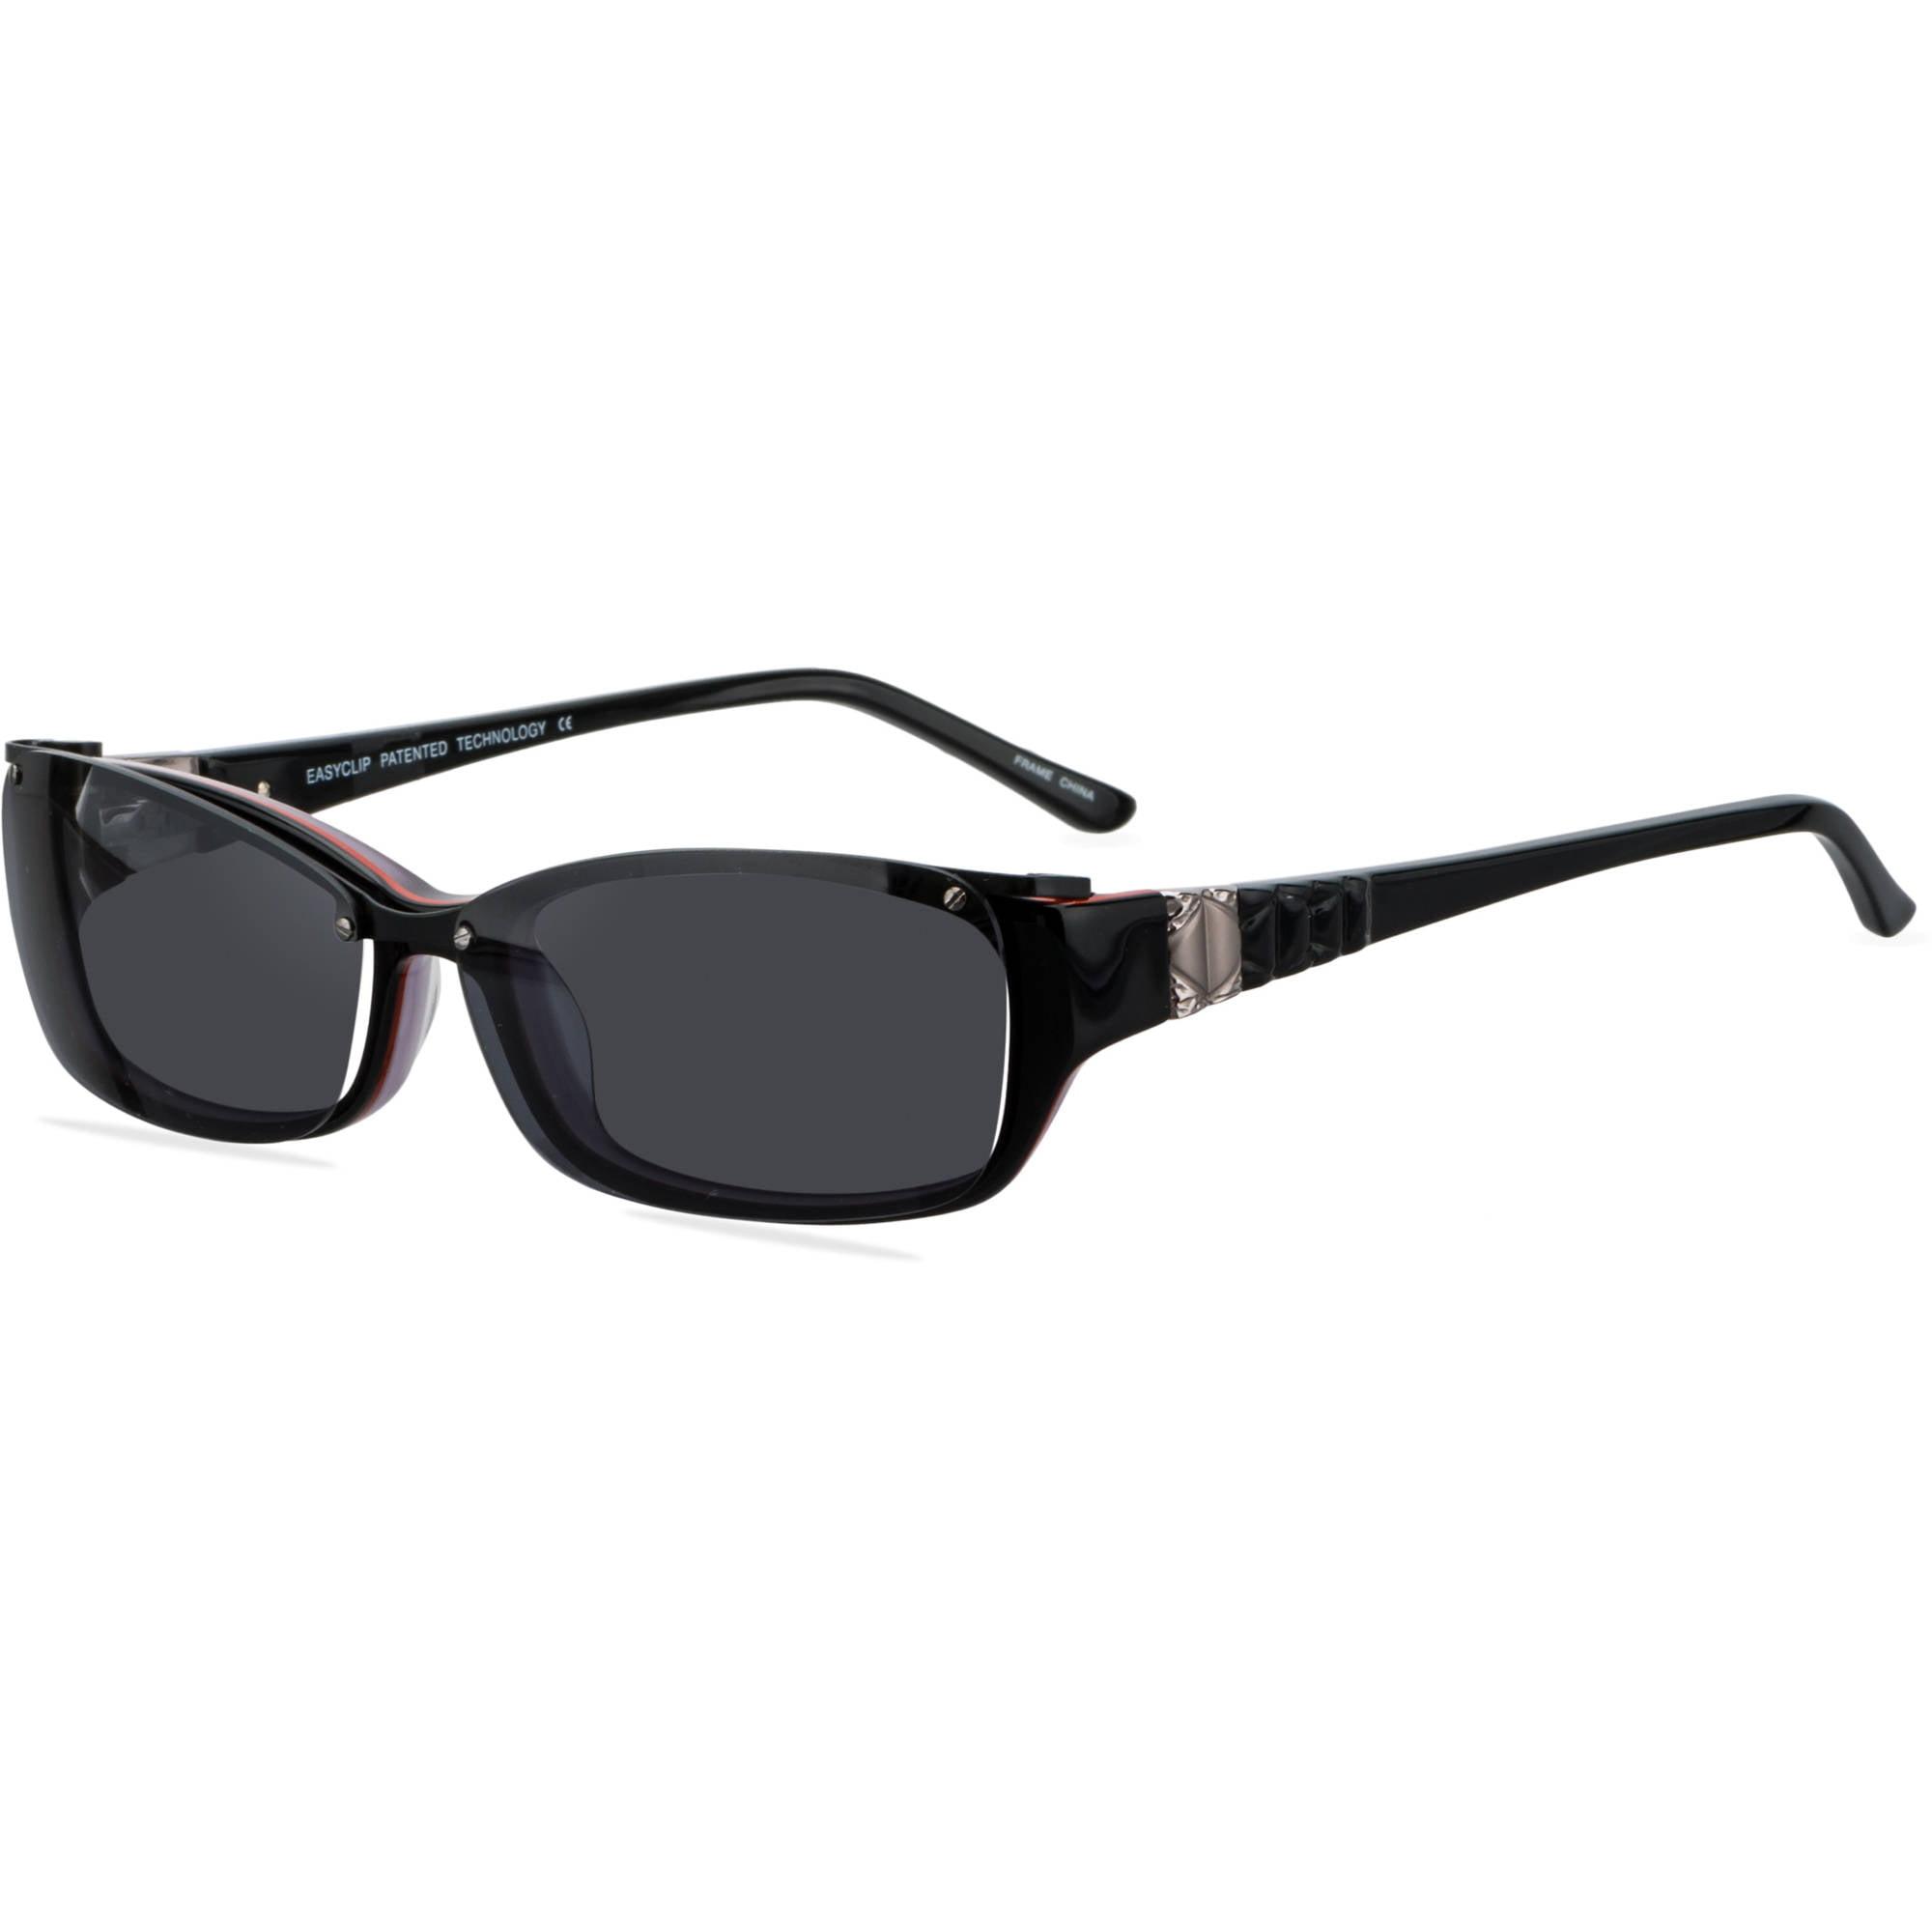 Easyclip Womens Prescription Glasses Ec241 Black Kacamata Sunglasses Magnet 5 In 1